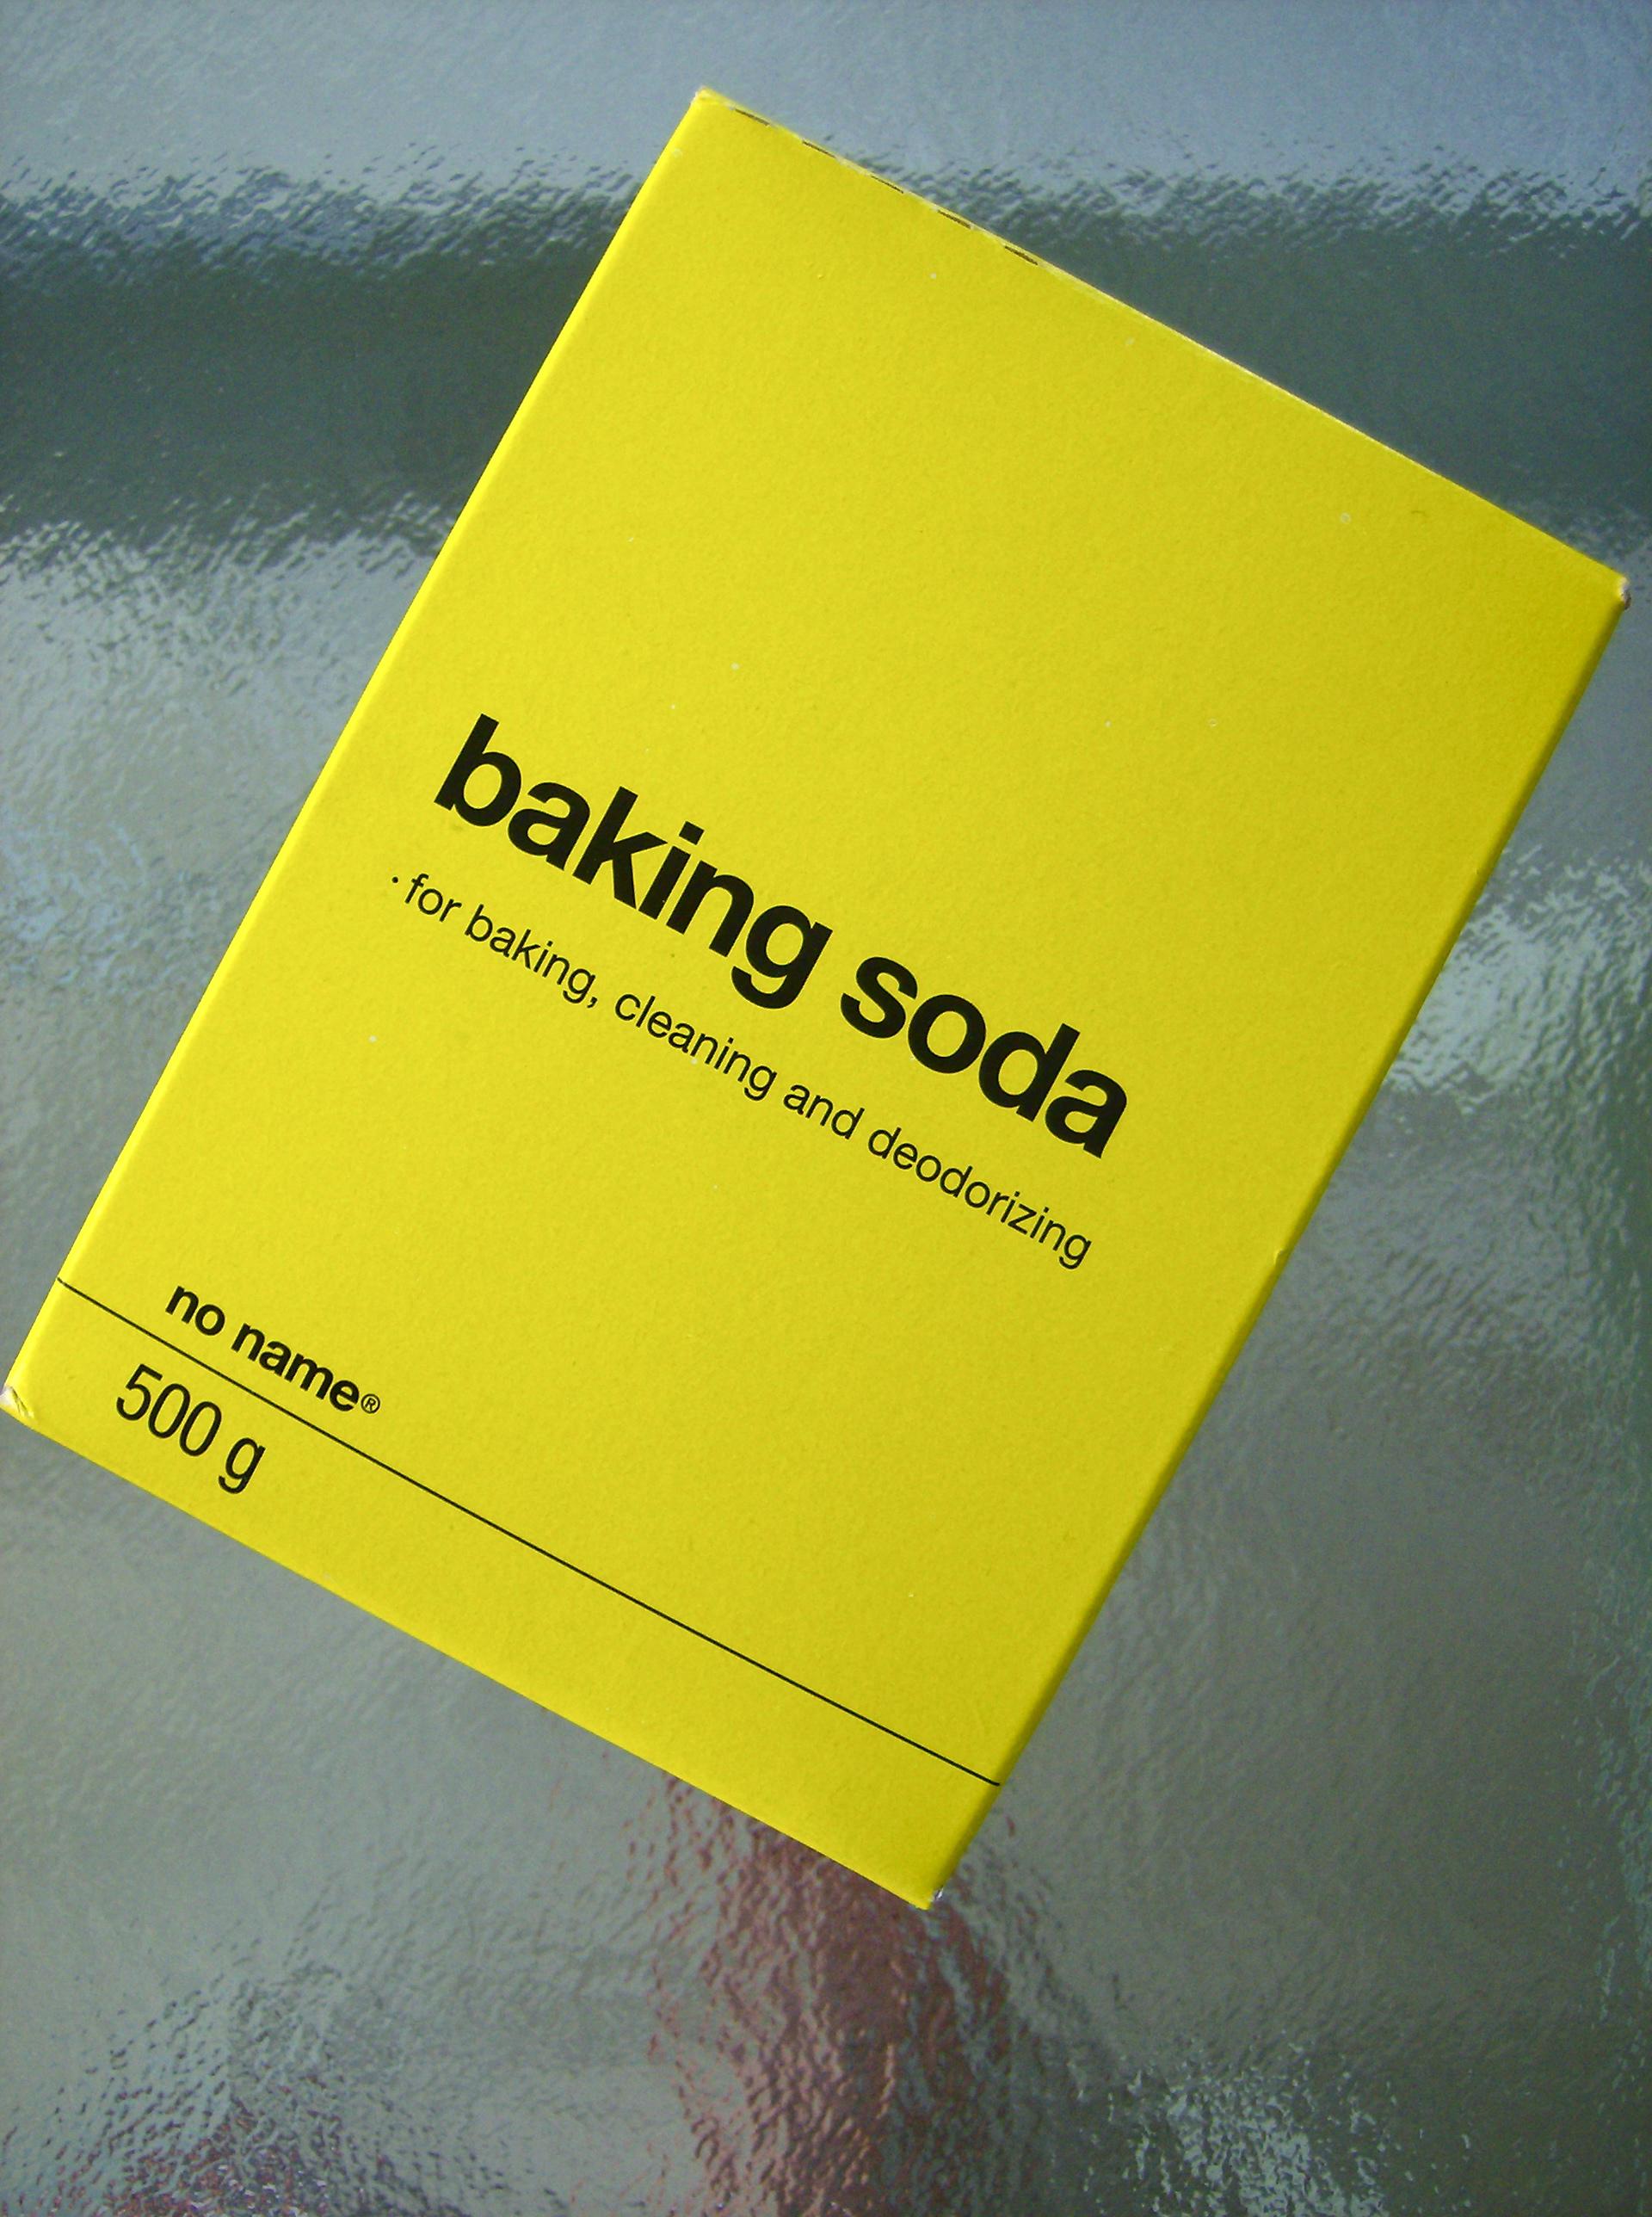 No_name_sans_nom_baking_soda